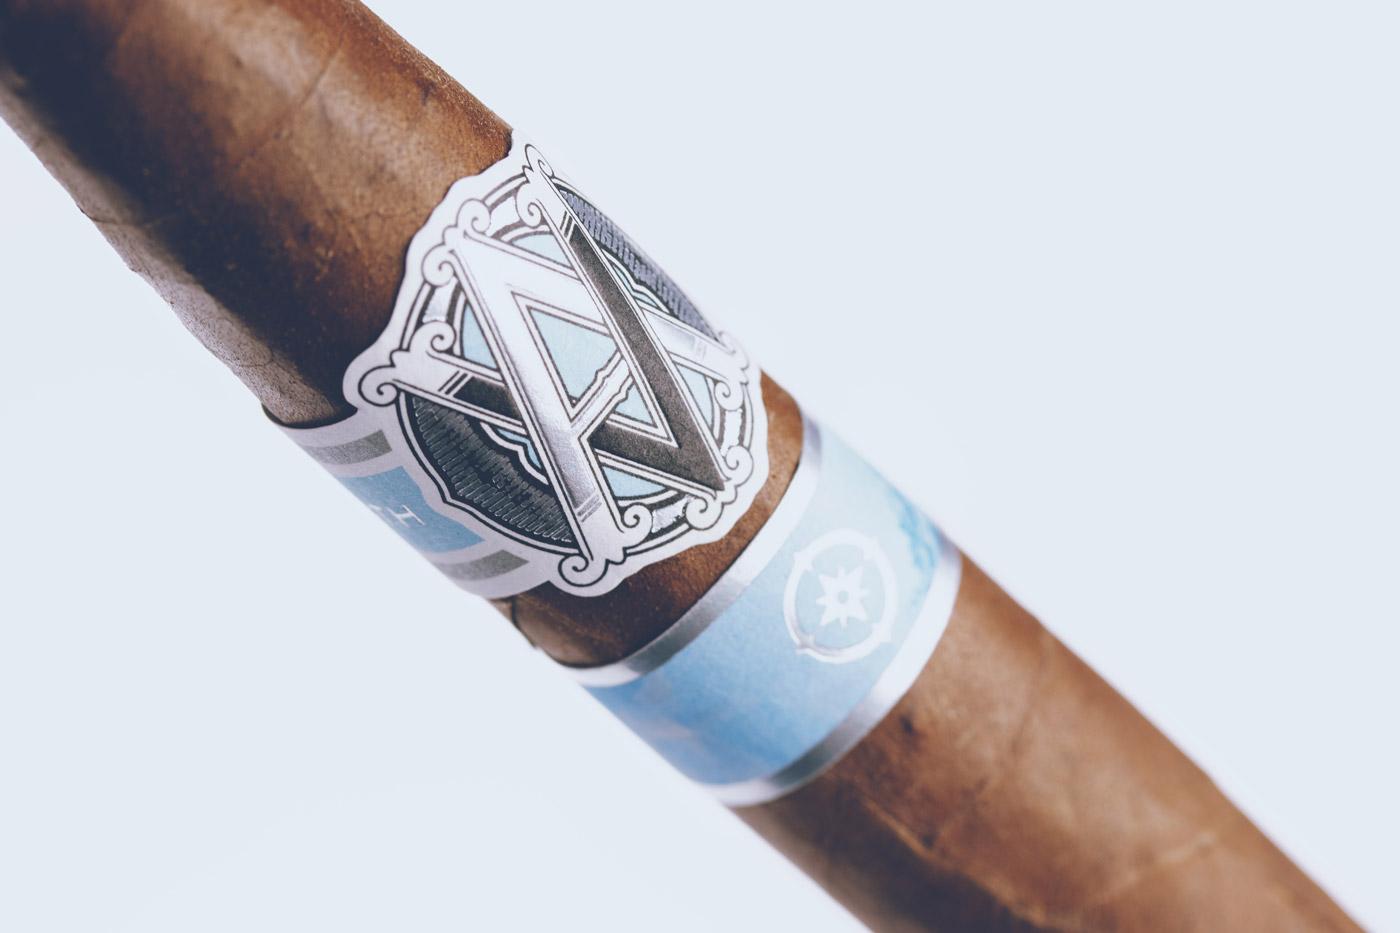 AVO Regional South Edition cigar review